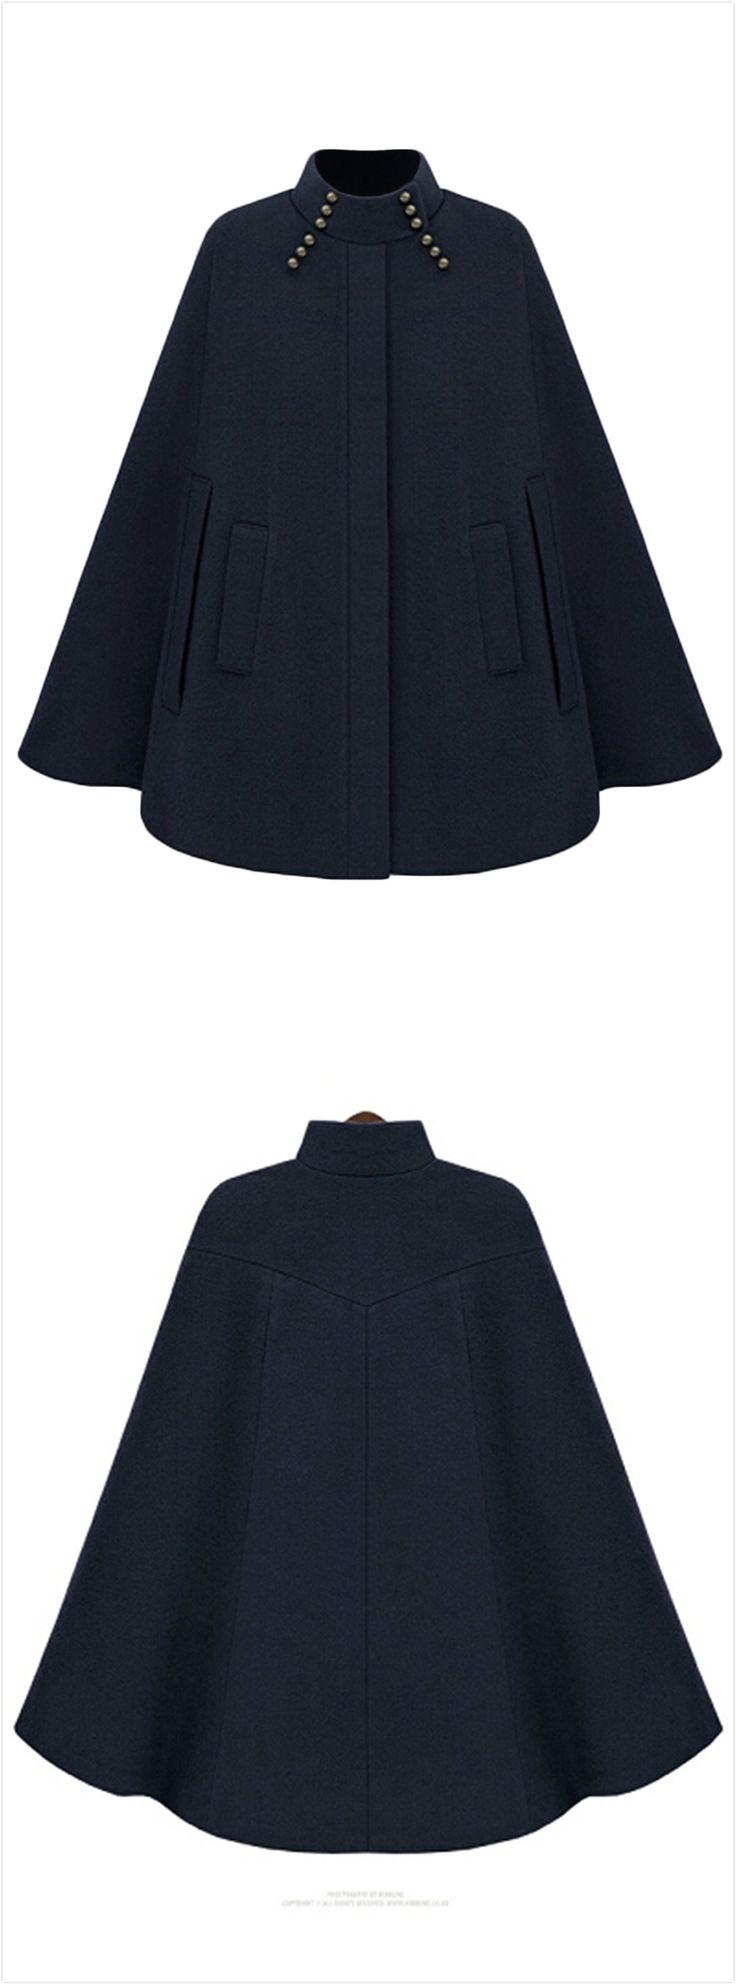 Womens Fashion Winter Warm Woolen Cape Cloak Coat